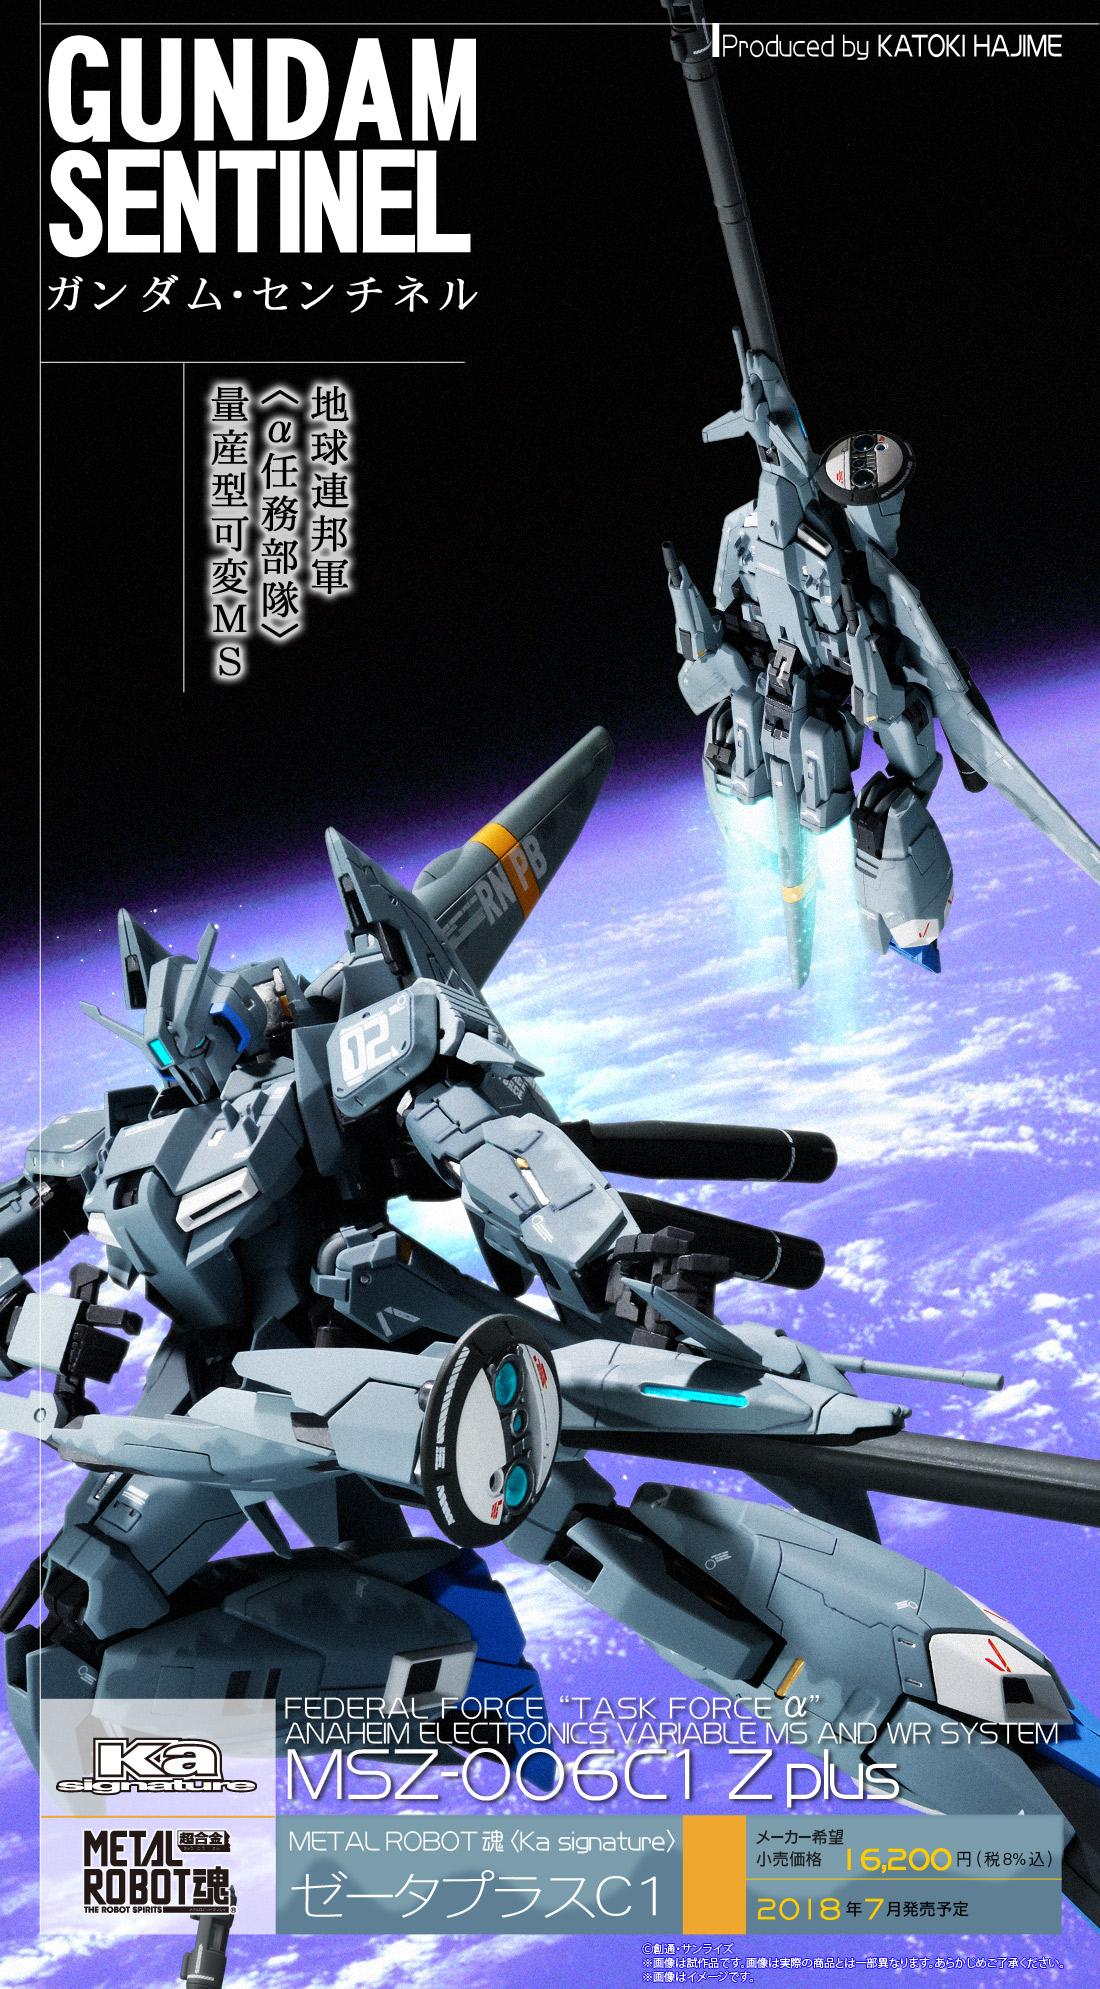 Gundam : Metal Robot Ka Signature (Bandai) CC2lLQlh_o